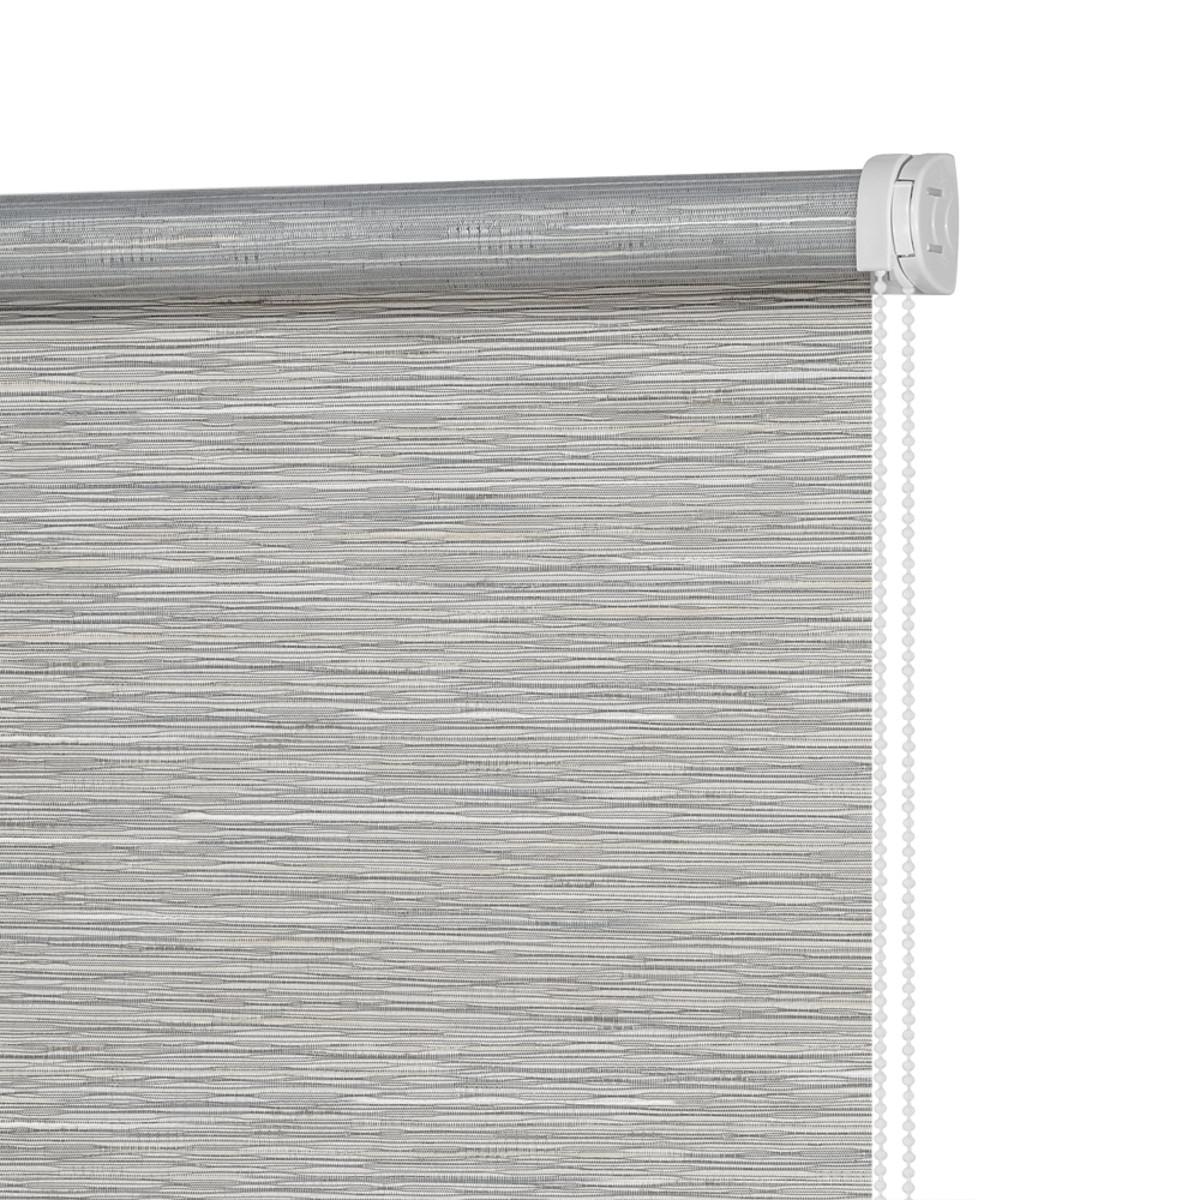 Рулонная Ора Decofest Комо 50Х160 Цвет Серый